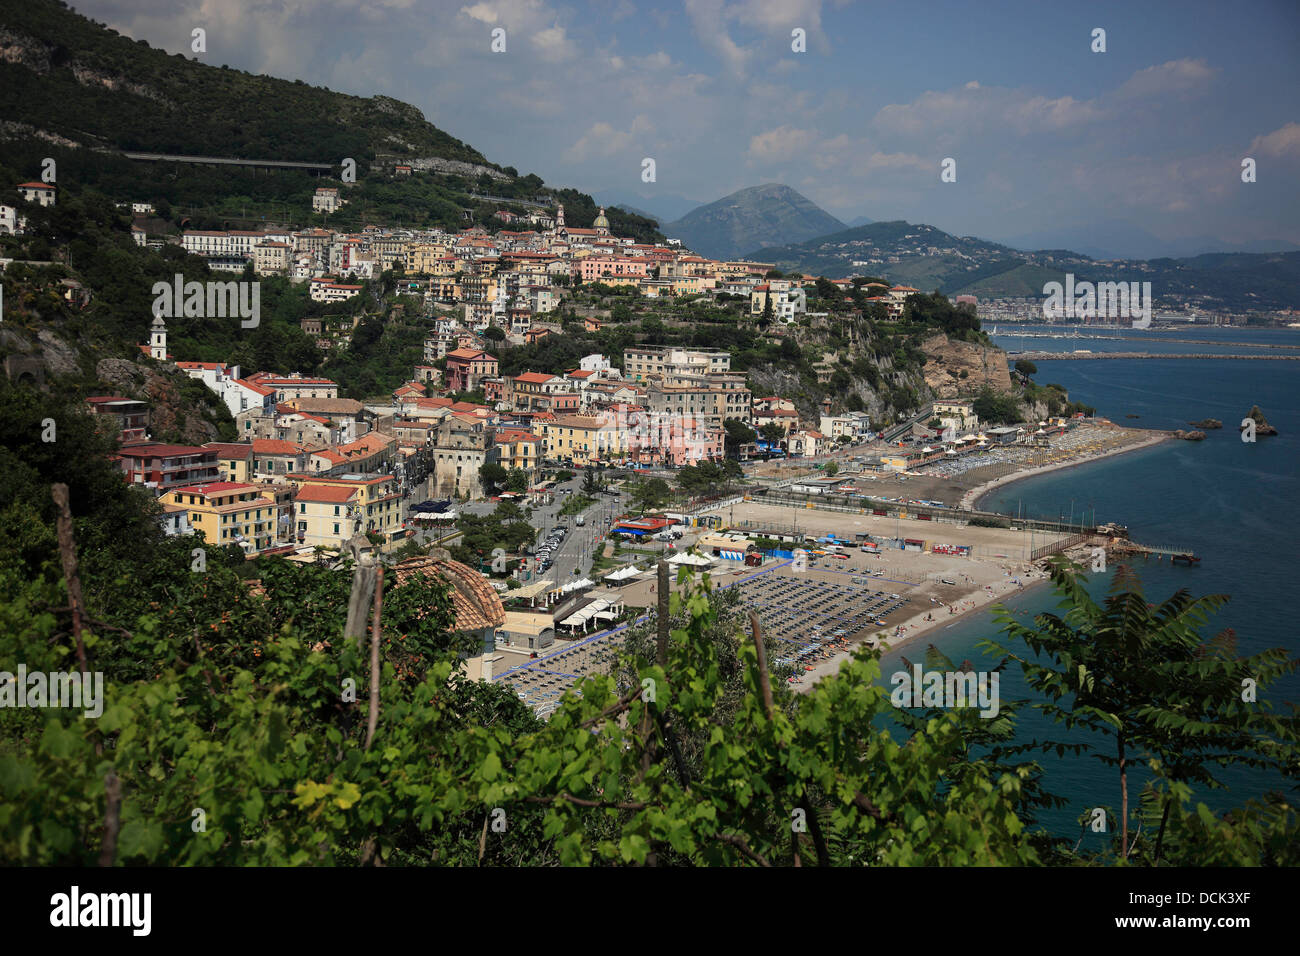 Vietri sul Mare, Campania, Italy, on the Amalfi Coast Cetara Stock Photo